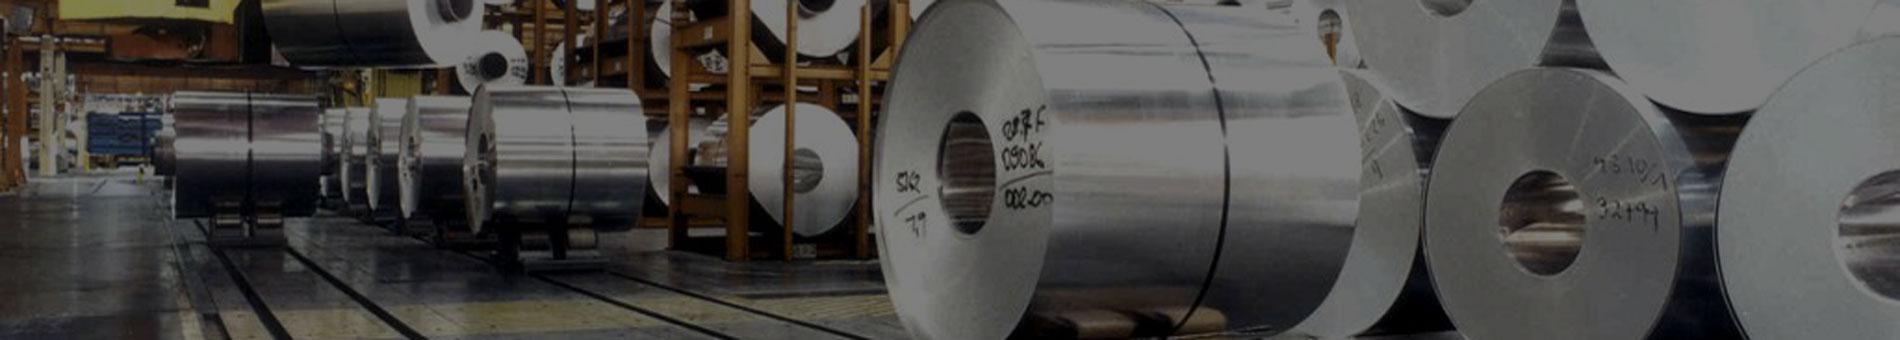 ALUMINIUM 2016 Is THE B2B Platform for the Aluminium Industry